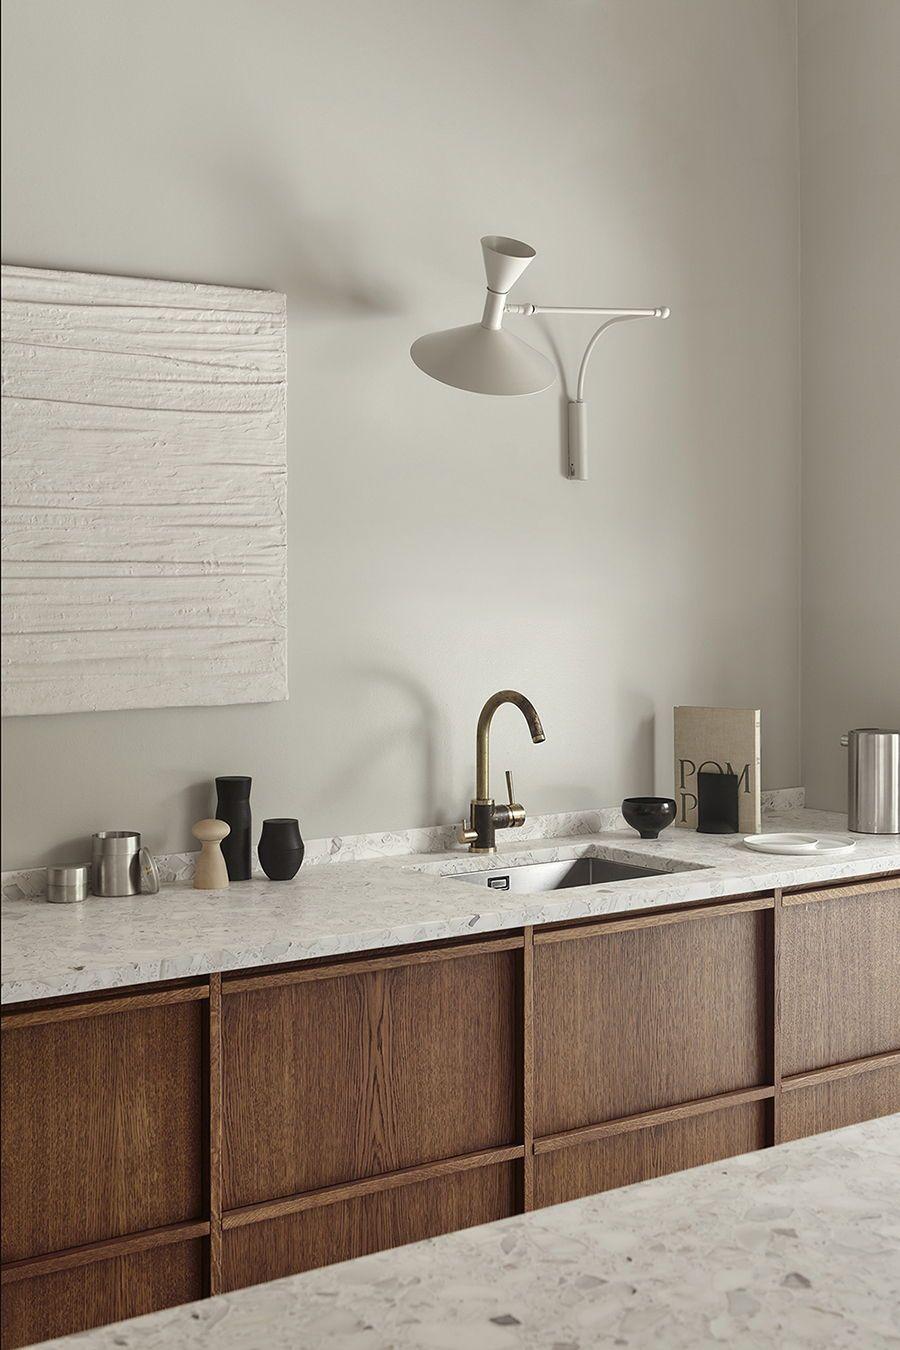 Discover The Latest Scandinavian Design Kitchens Nordiska Kok In 2020 Minimalist Home Decor Home Decor Kitchen Minimalist Furniture